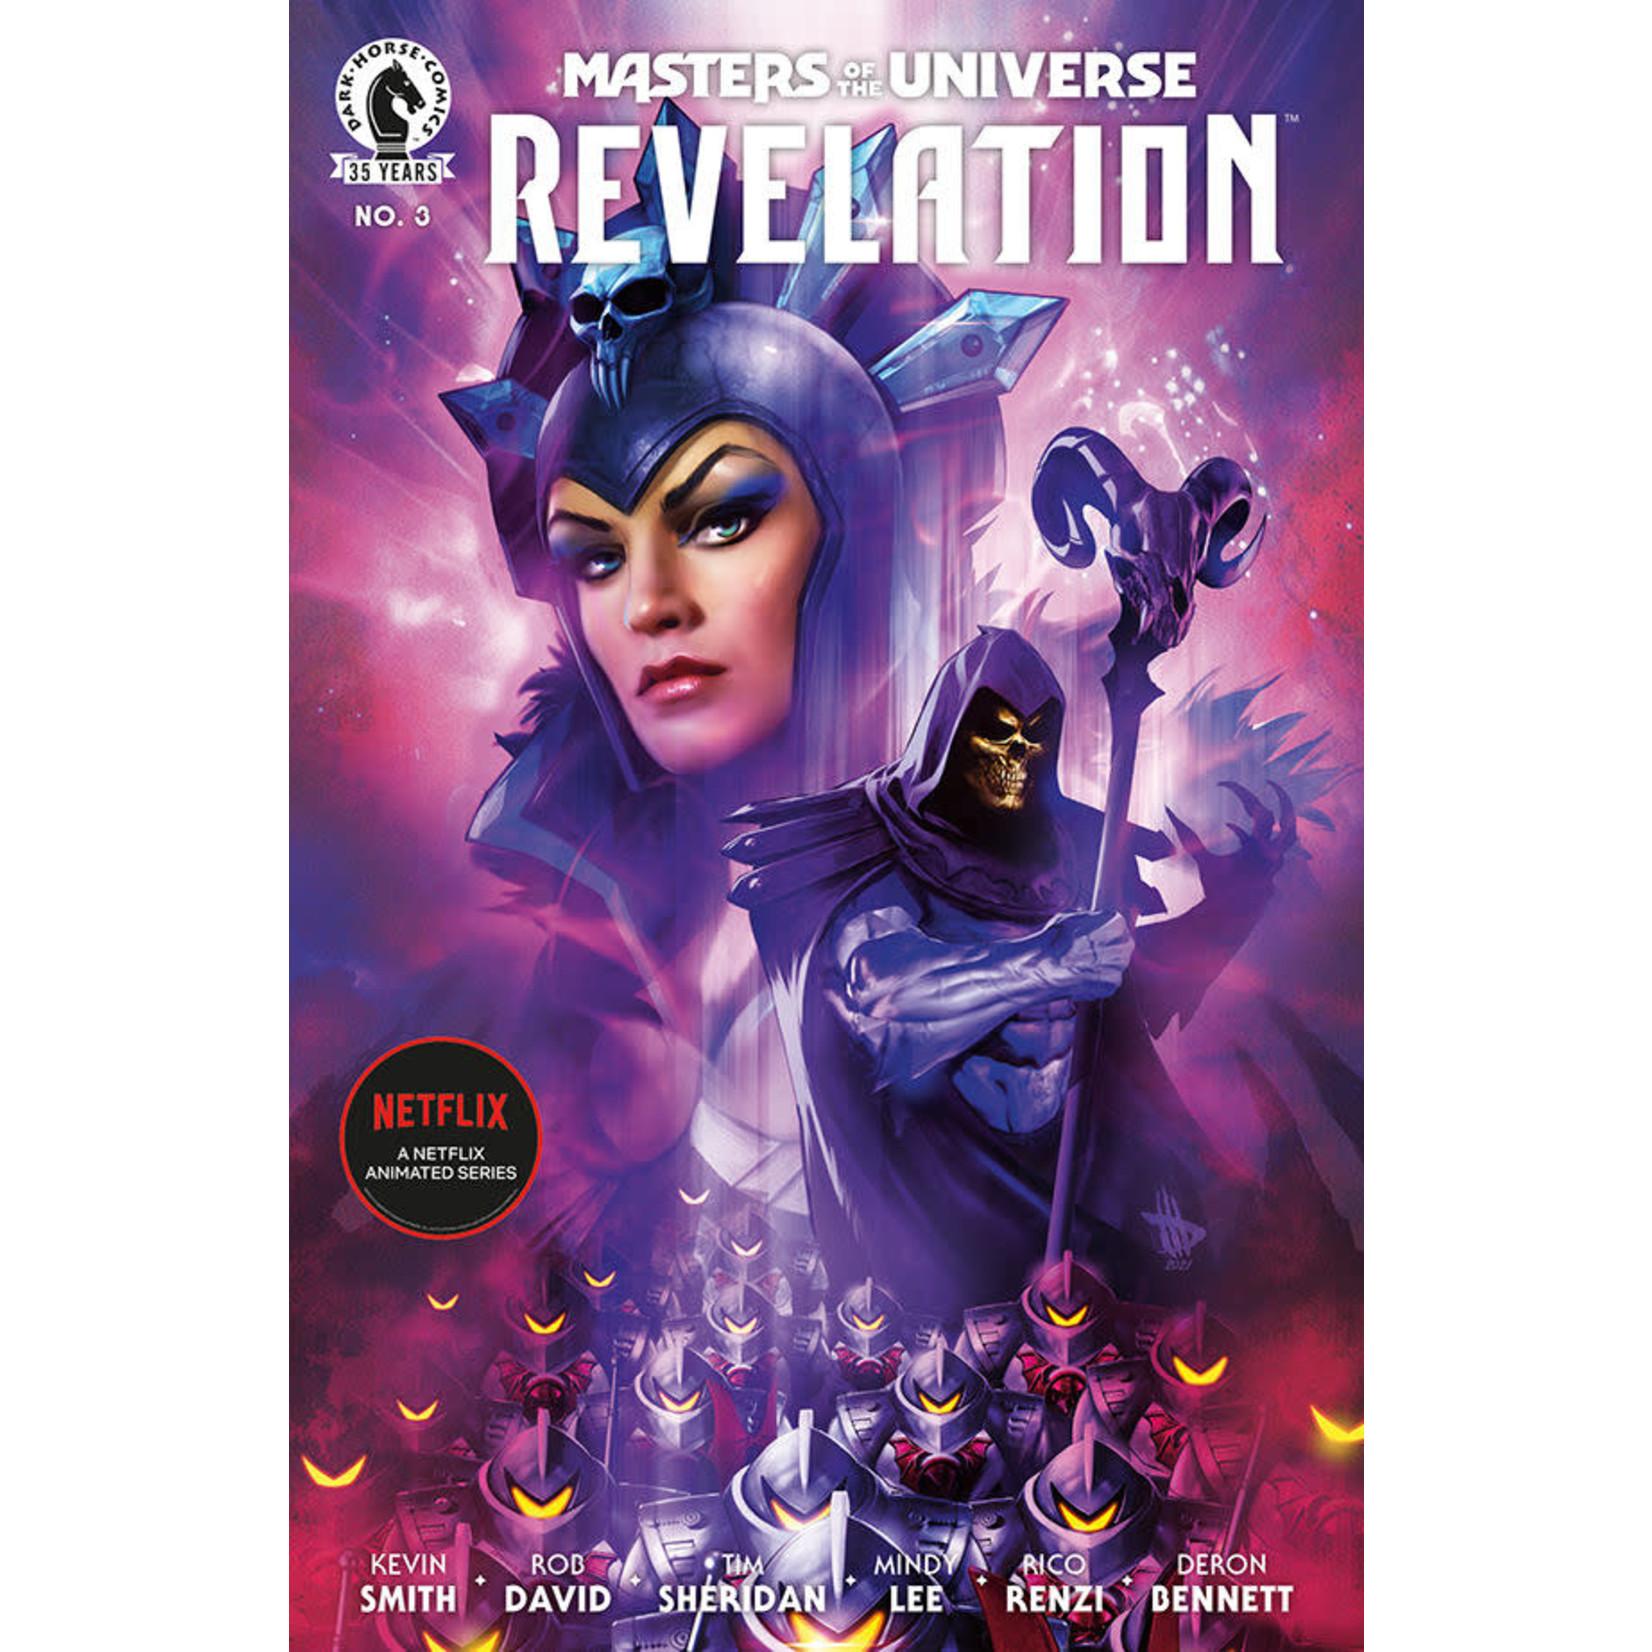 Dark Horse Copy of Master of the universe Revelation #2